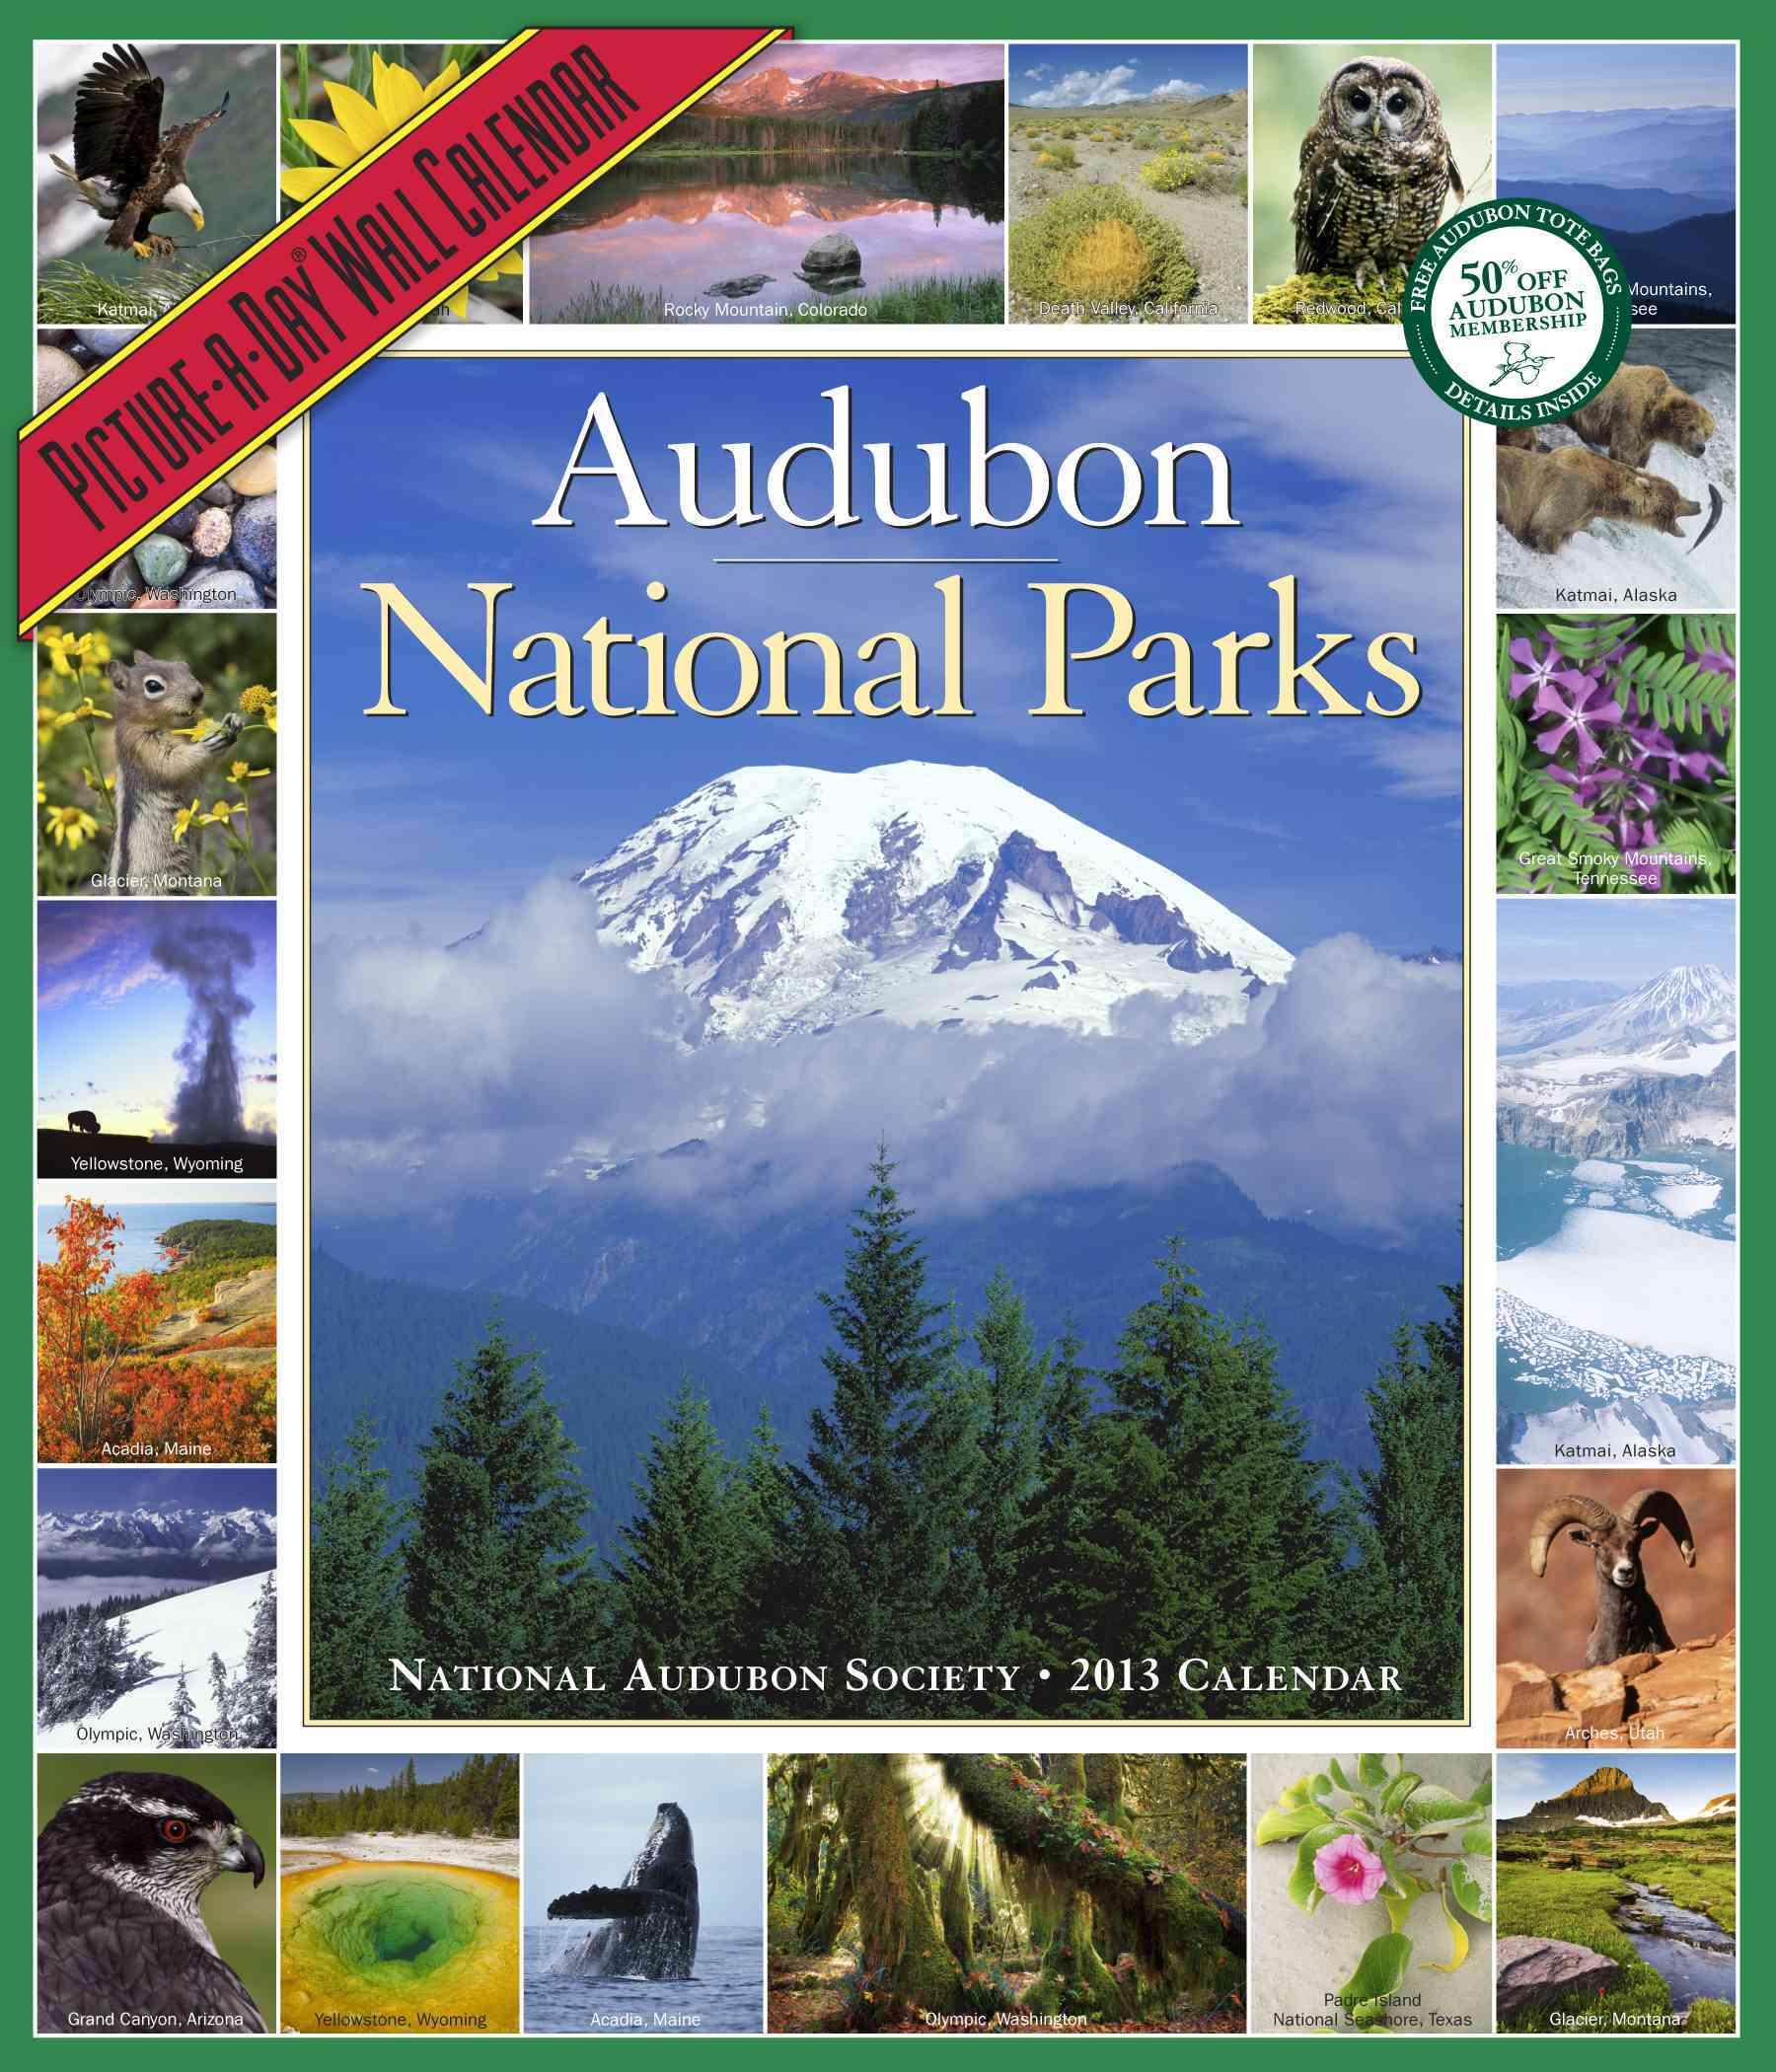 Audubon National Parks Calendar 2013